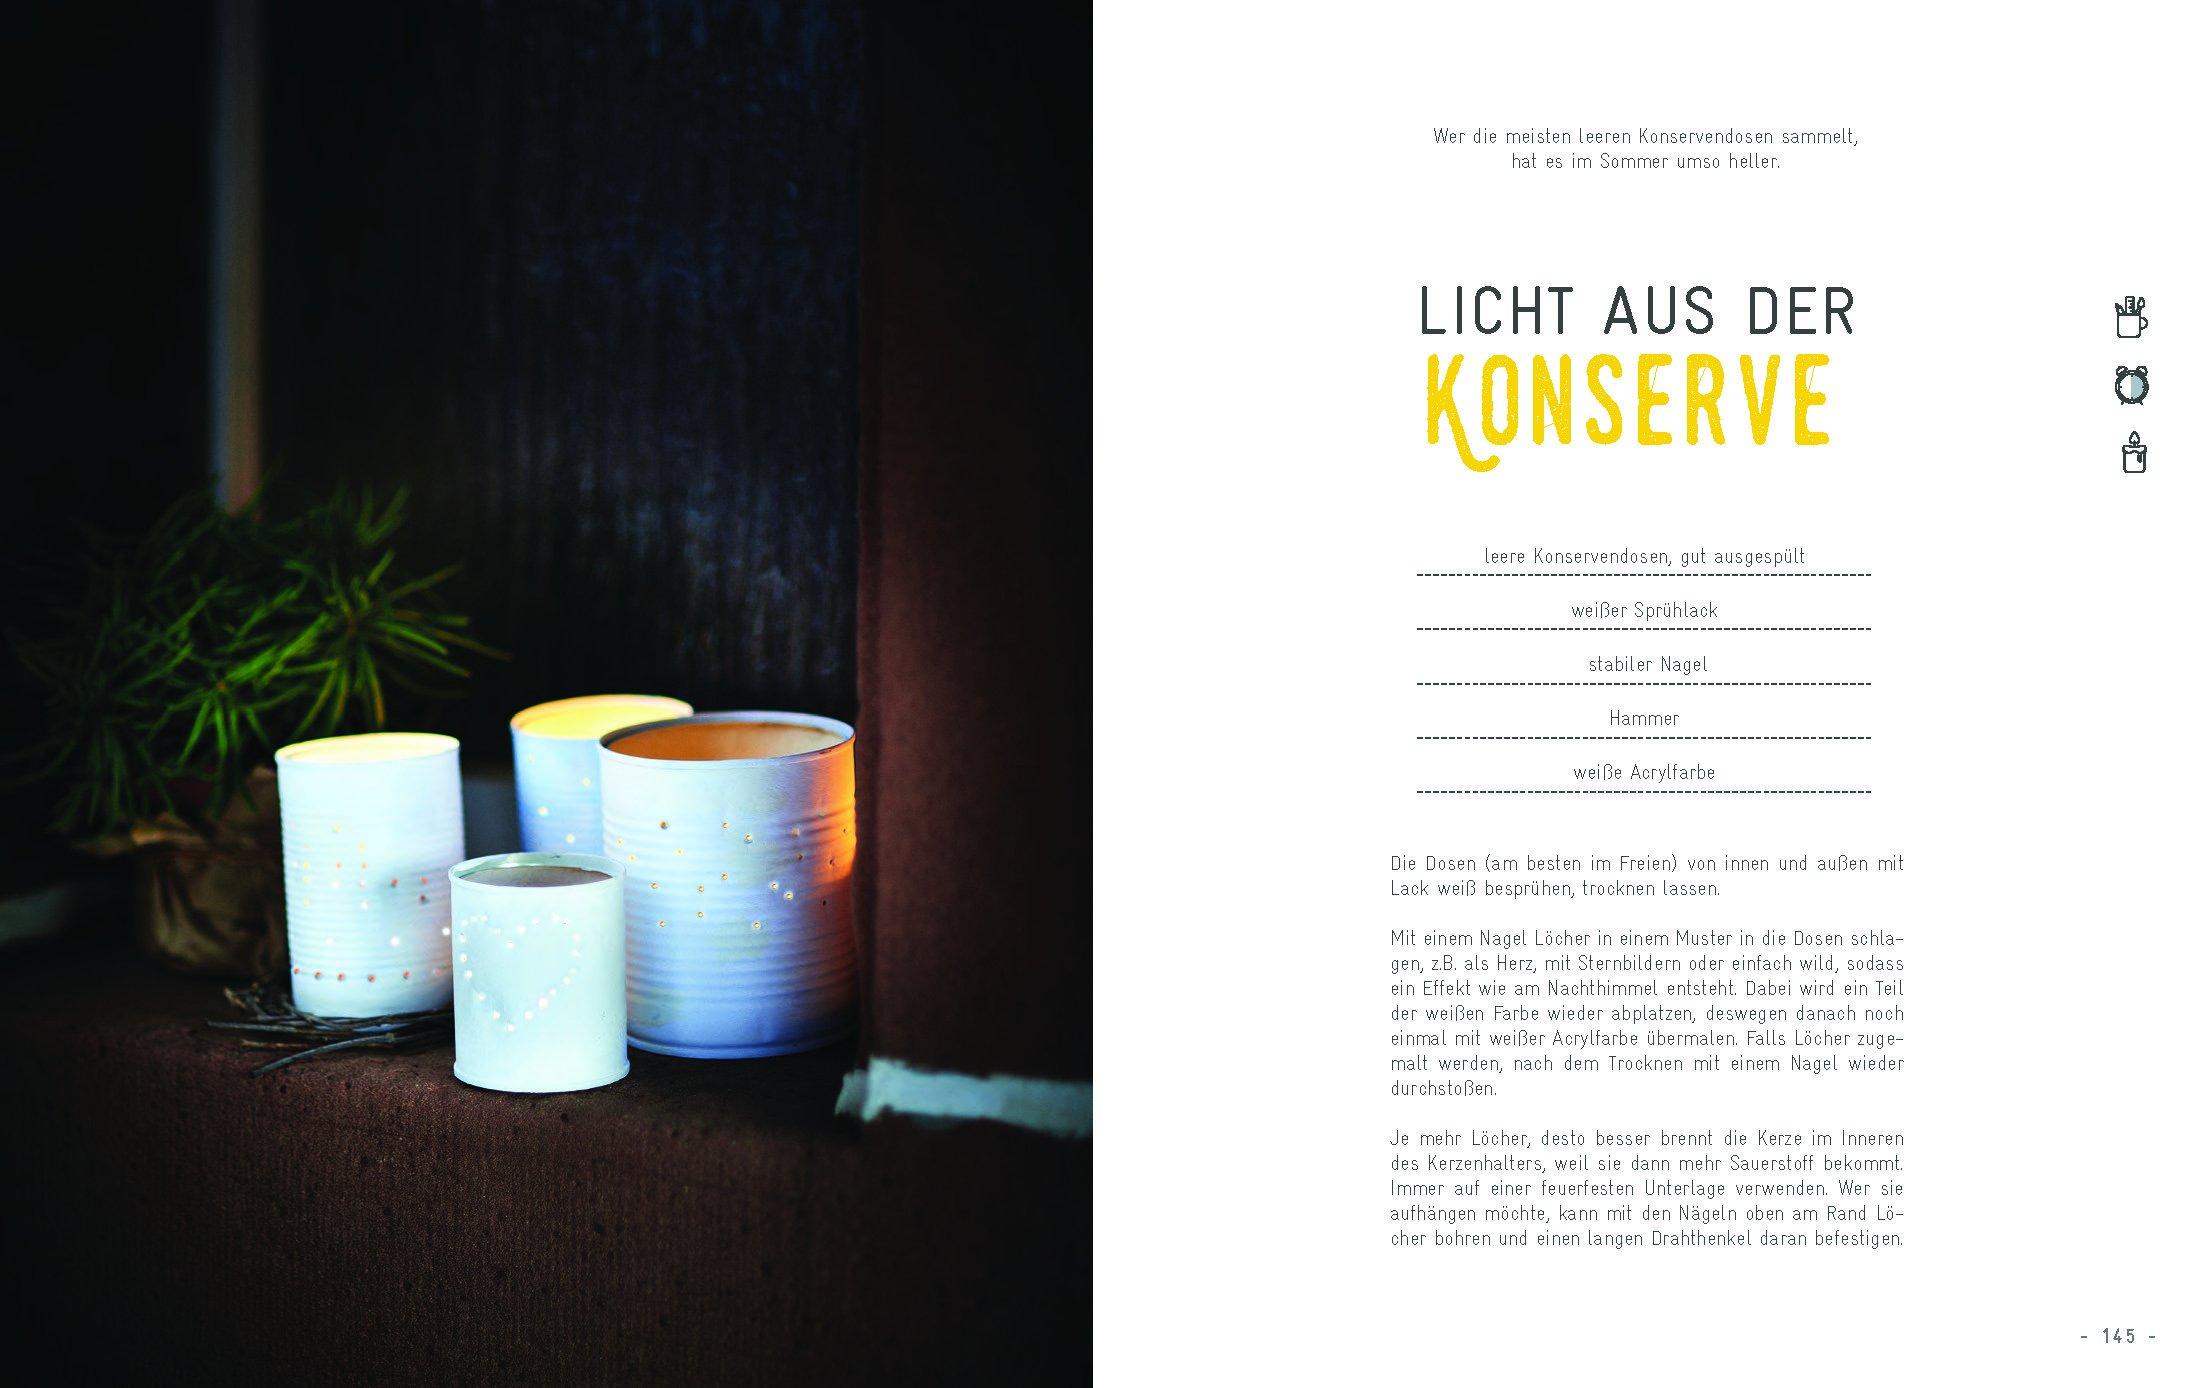 Berühmt Sommerfarbe Nach Nummer Fotos - Entry Level Resume Vorlagen ...